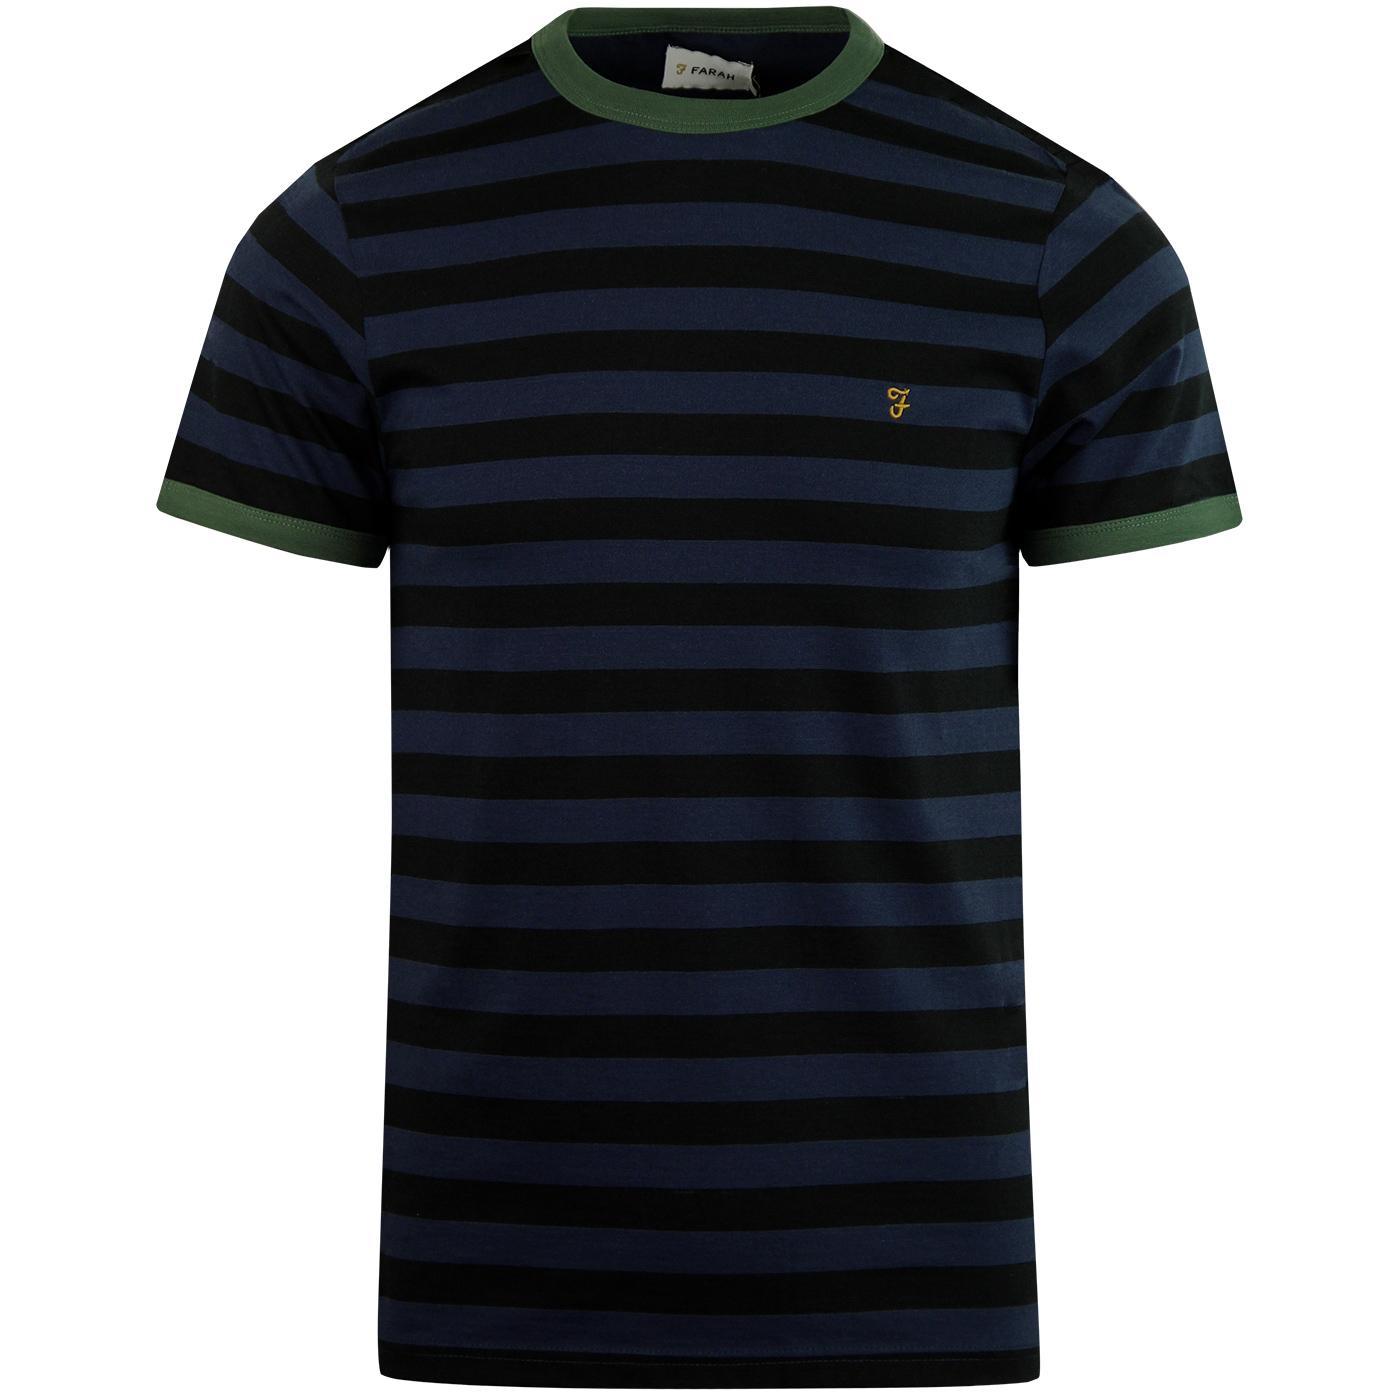 Belgrove FARAH Retro Men's Stripe Tee (Deep Black)